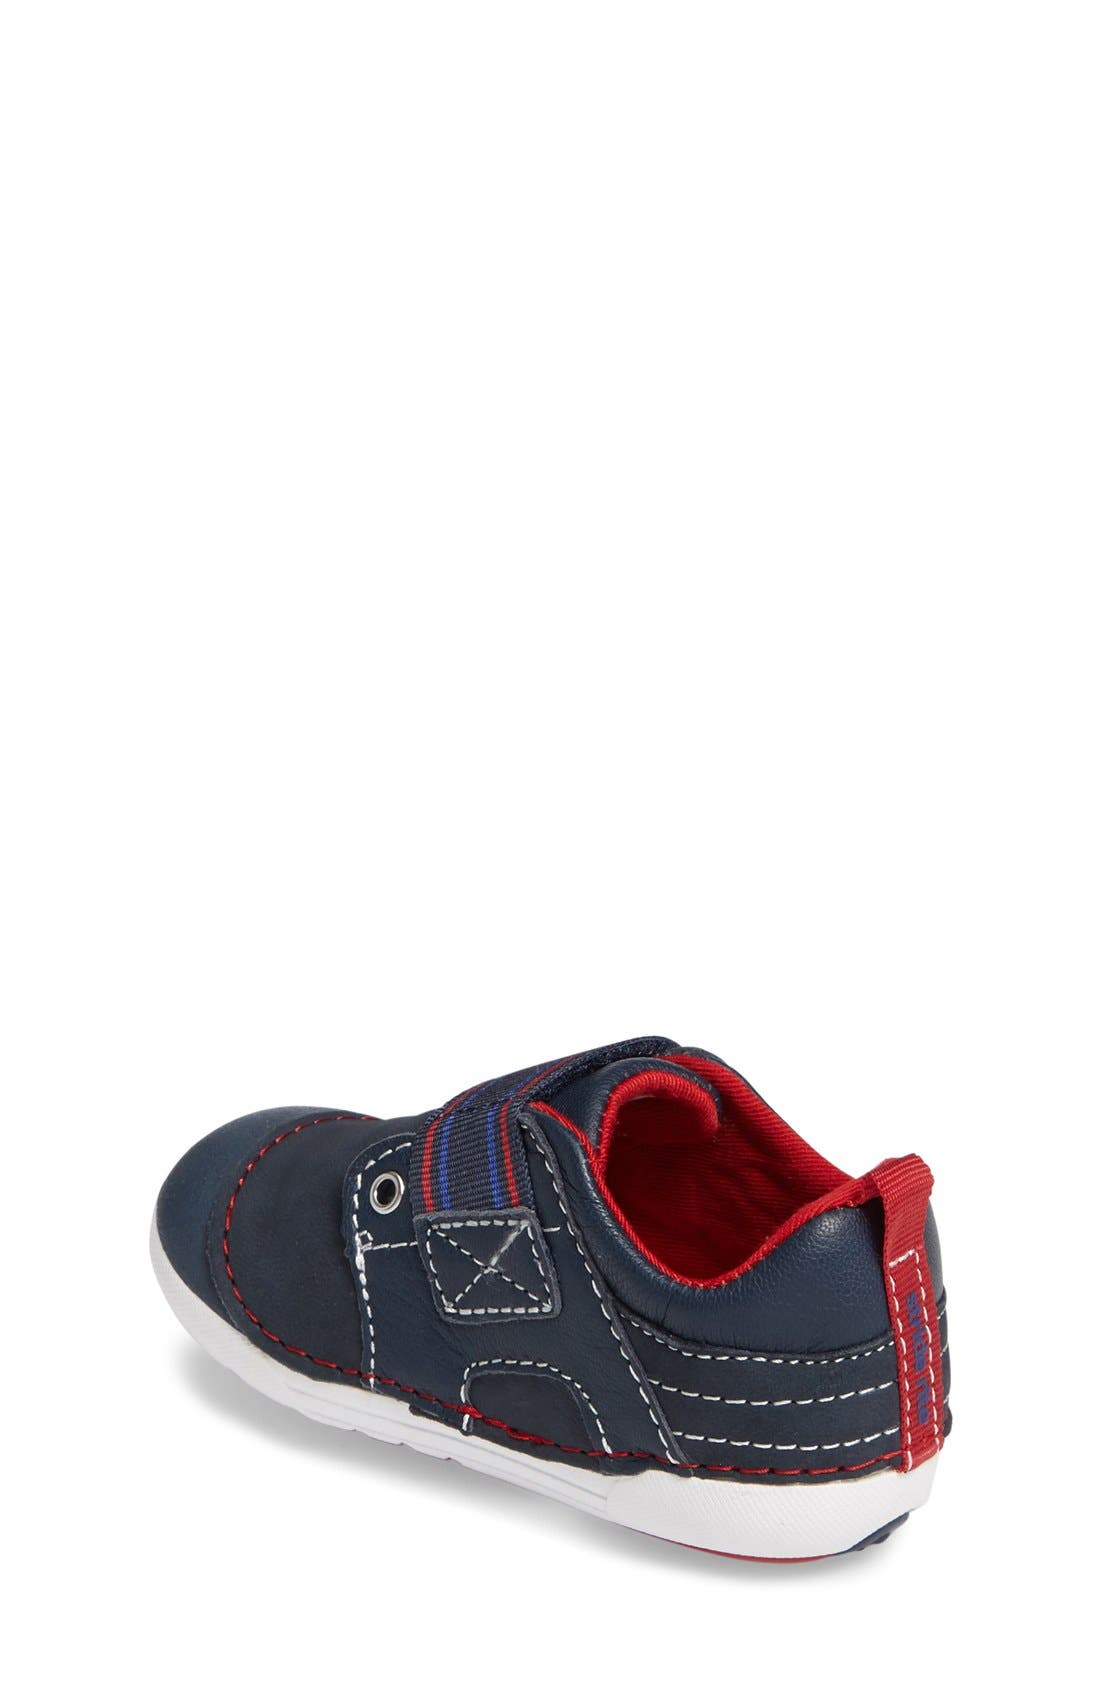 Alternate Image 2  - Stride Rite Soft Motion™ Cameron Sneaker (Baby & Walker)